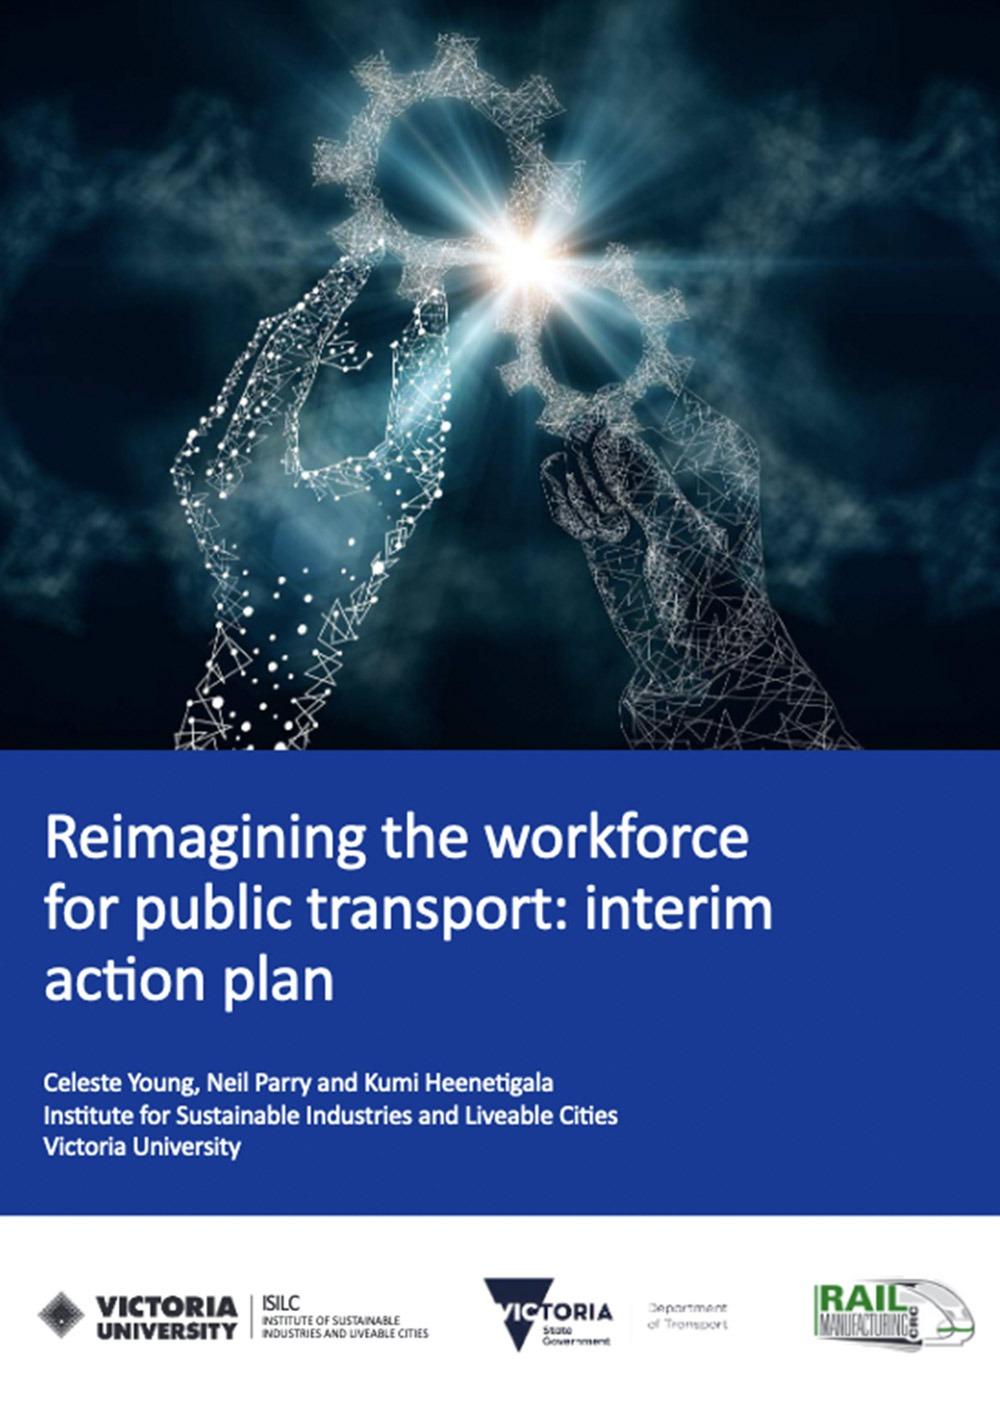 Interim action plan